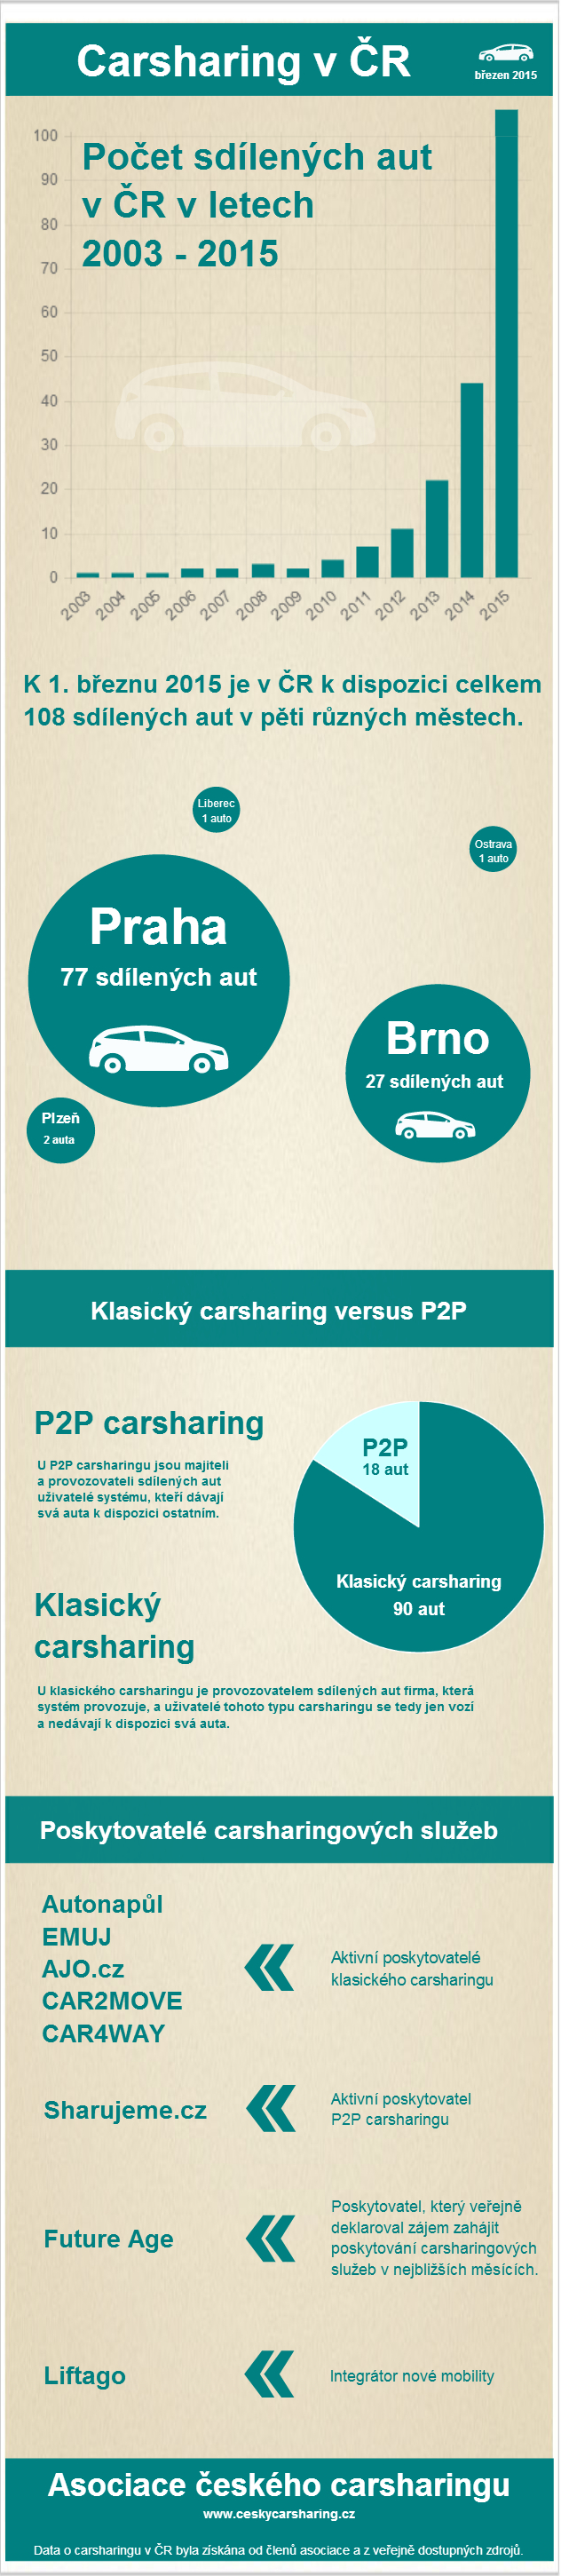 carsharing-cr-brezen-2015-vprac